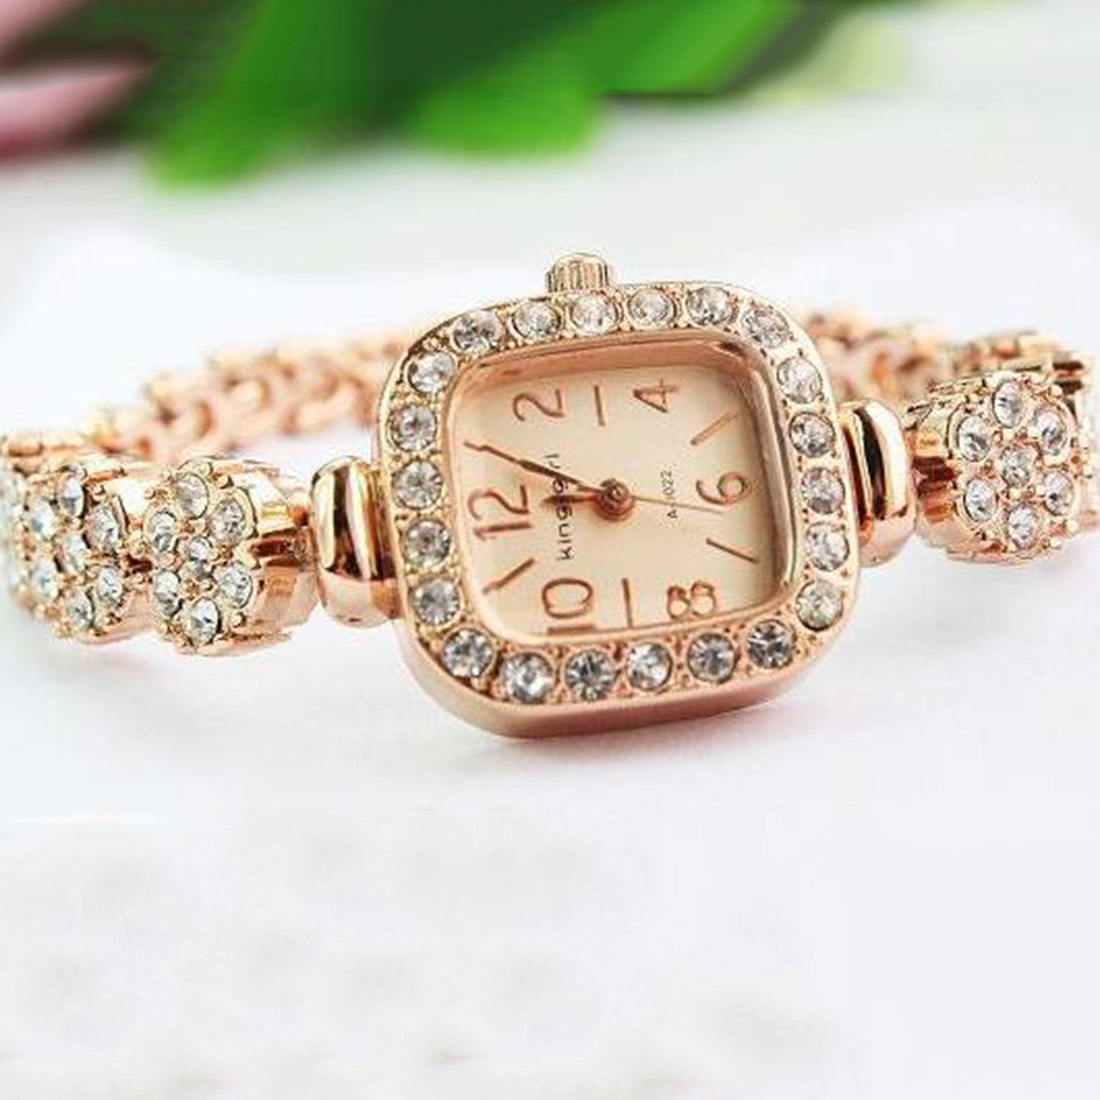 rhinestone-quartz-wristwatch-women-luxury-gold-stainless-steel-font-b-rosefield-b-font-watches-dress-new-designer-ladies-wedding-clock-2018